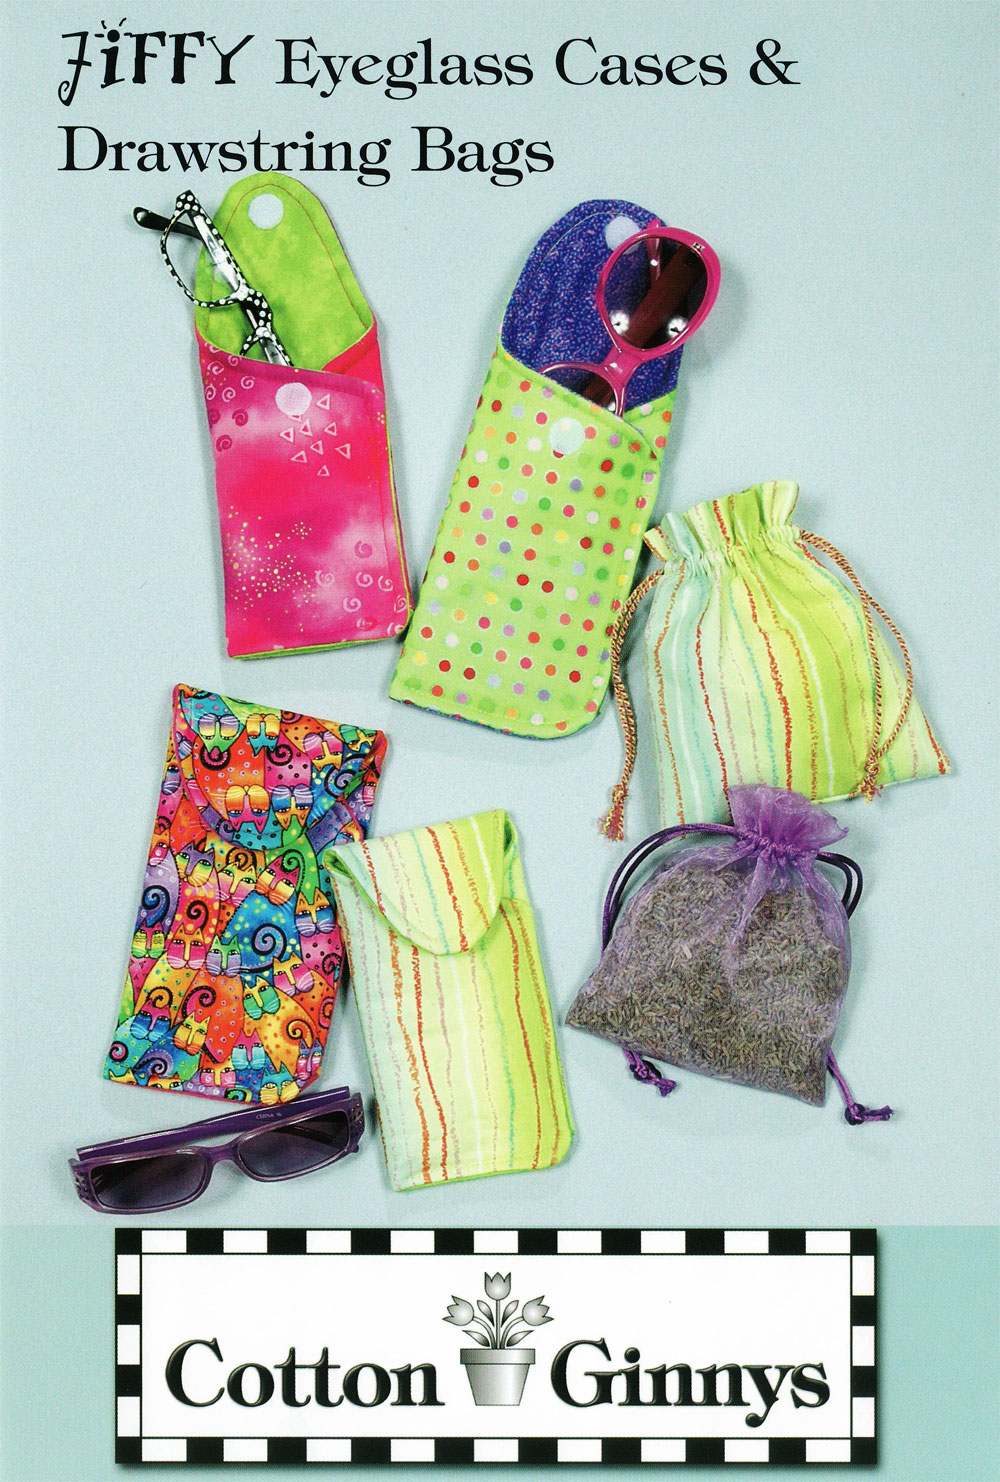 Jiffy-eyeglass-case-sewing-pattern-Cotton-Ginnys-front